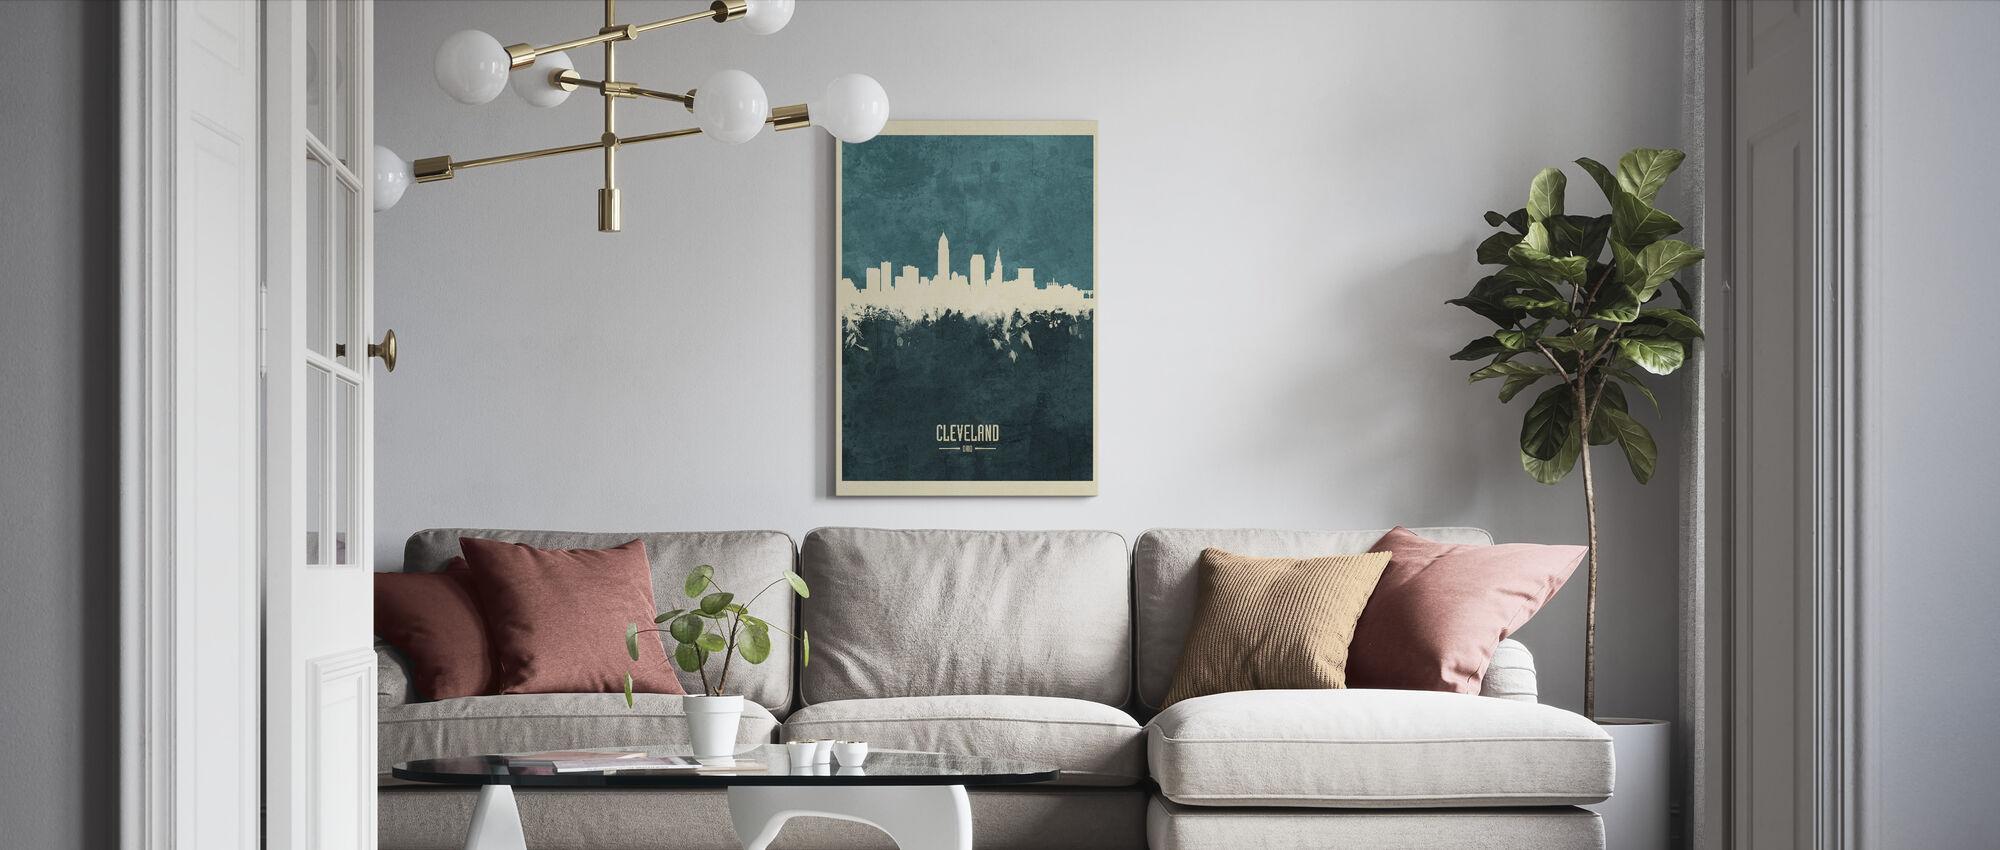 Cleveland Ohio Skyline Blauw - Canvas print - Woonkamer